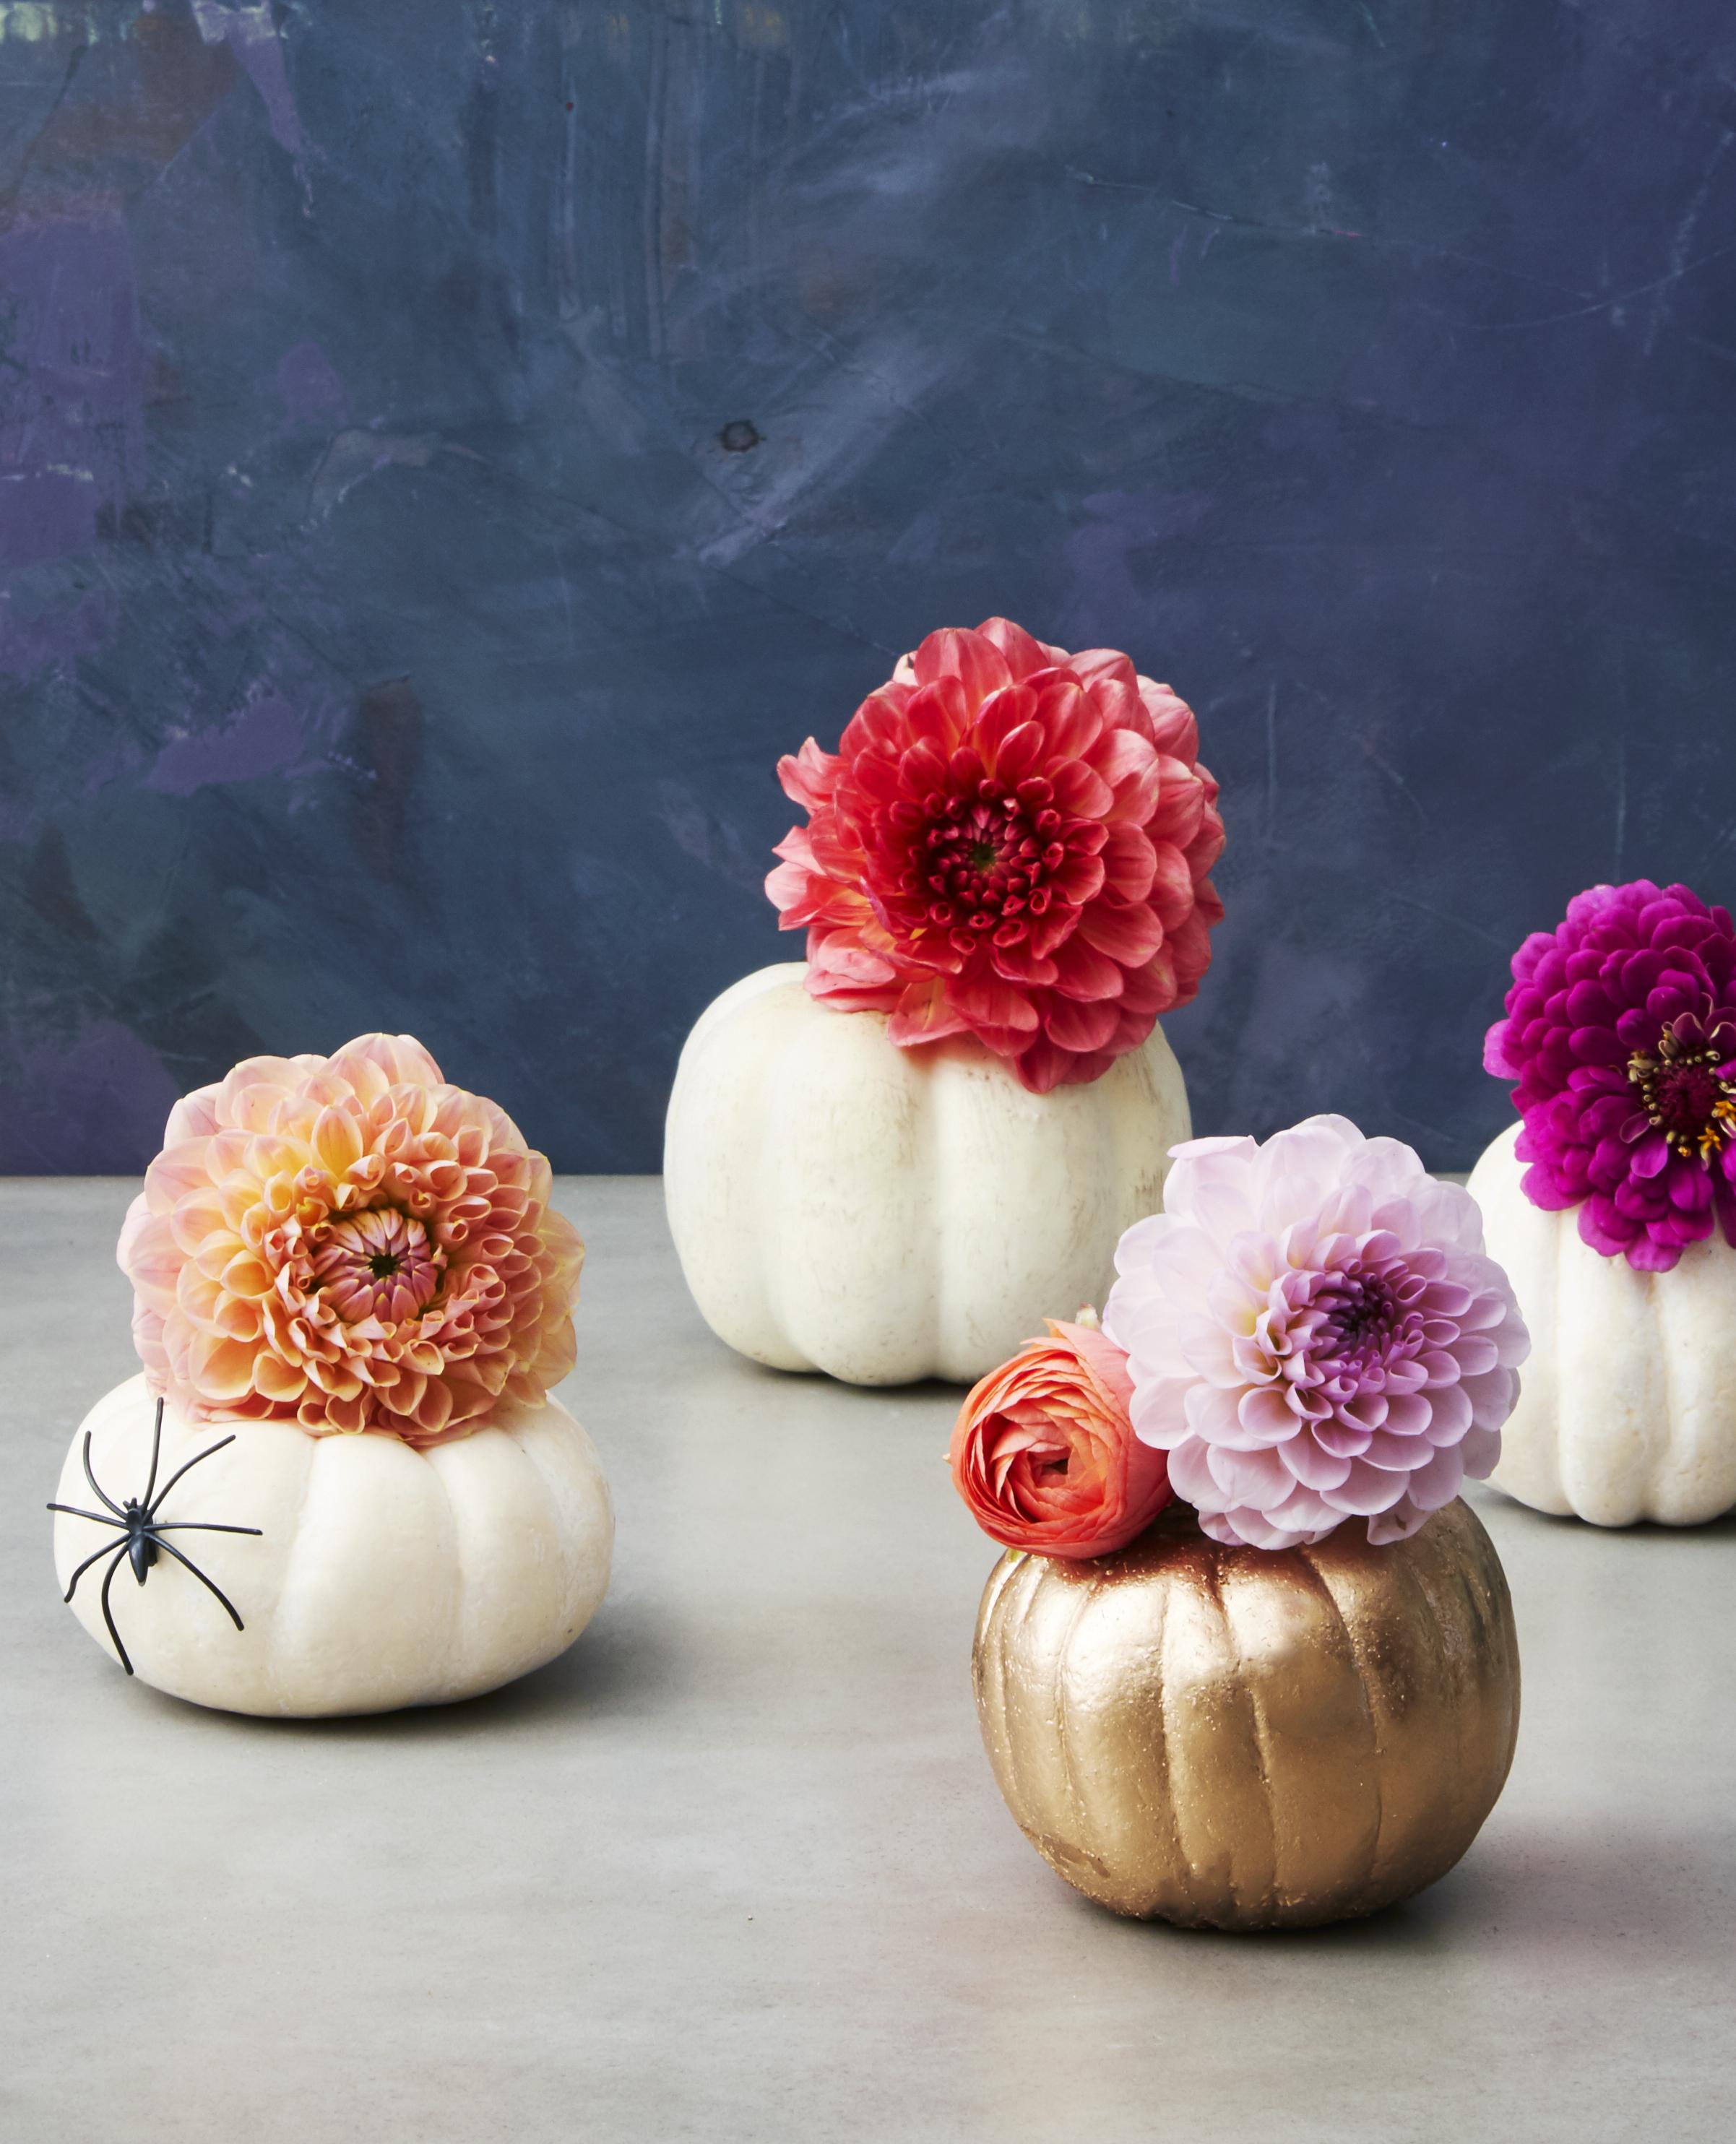 Flowers In A Pumpkin: 31 Easy Pumpkin Carving Ideas For Halloween 2017